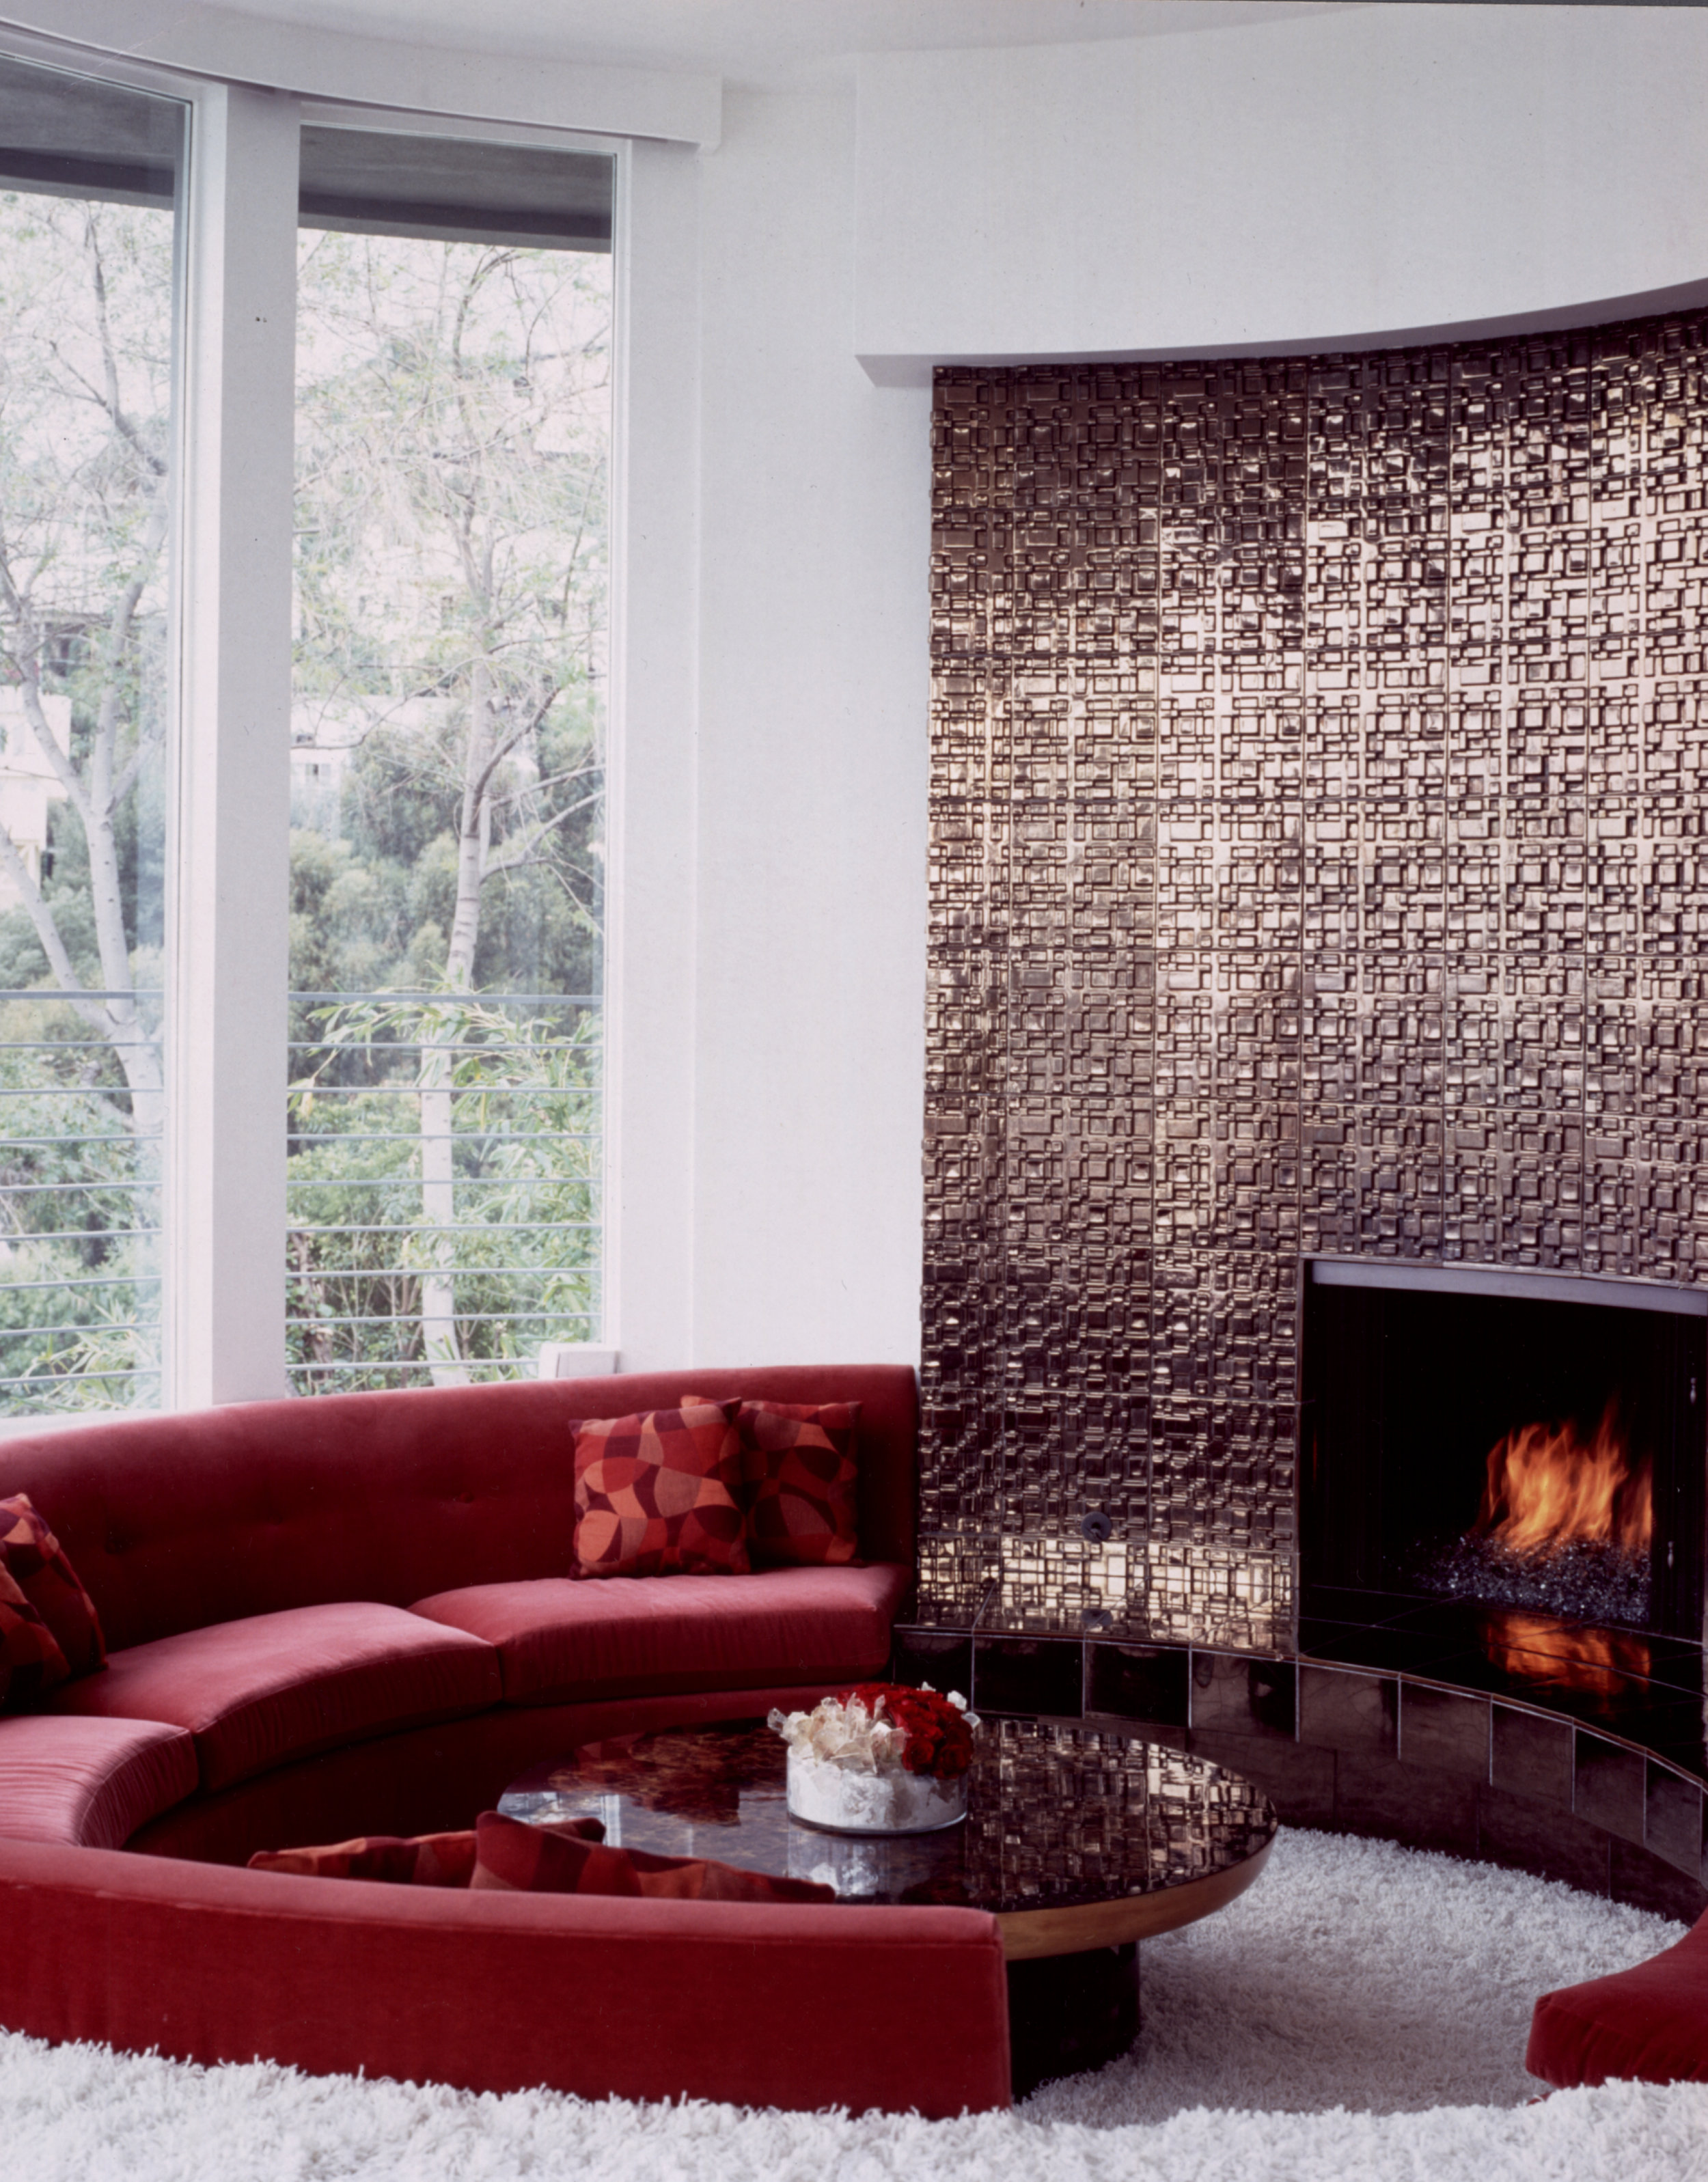 Page 2 Fireplace.jpg